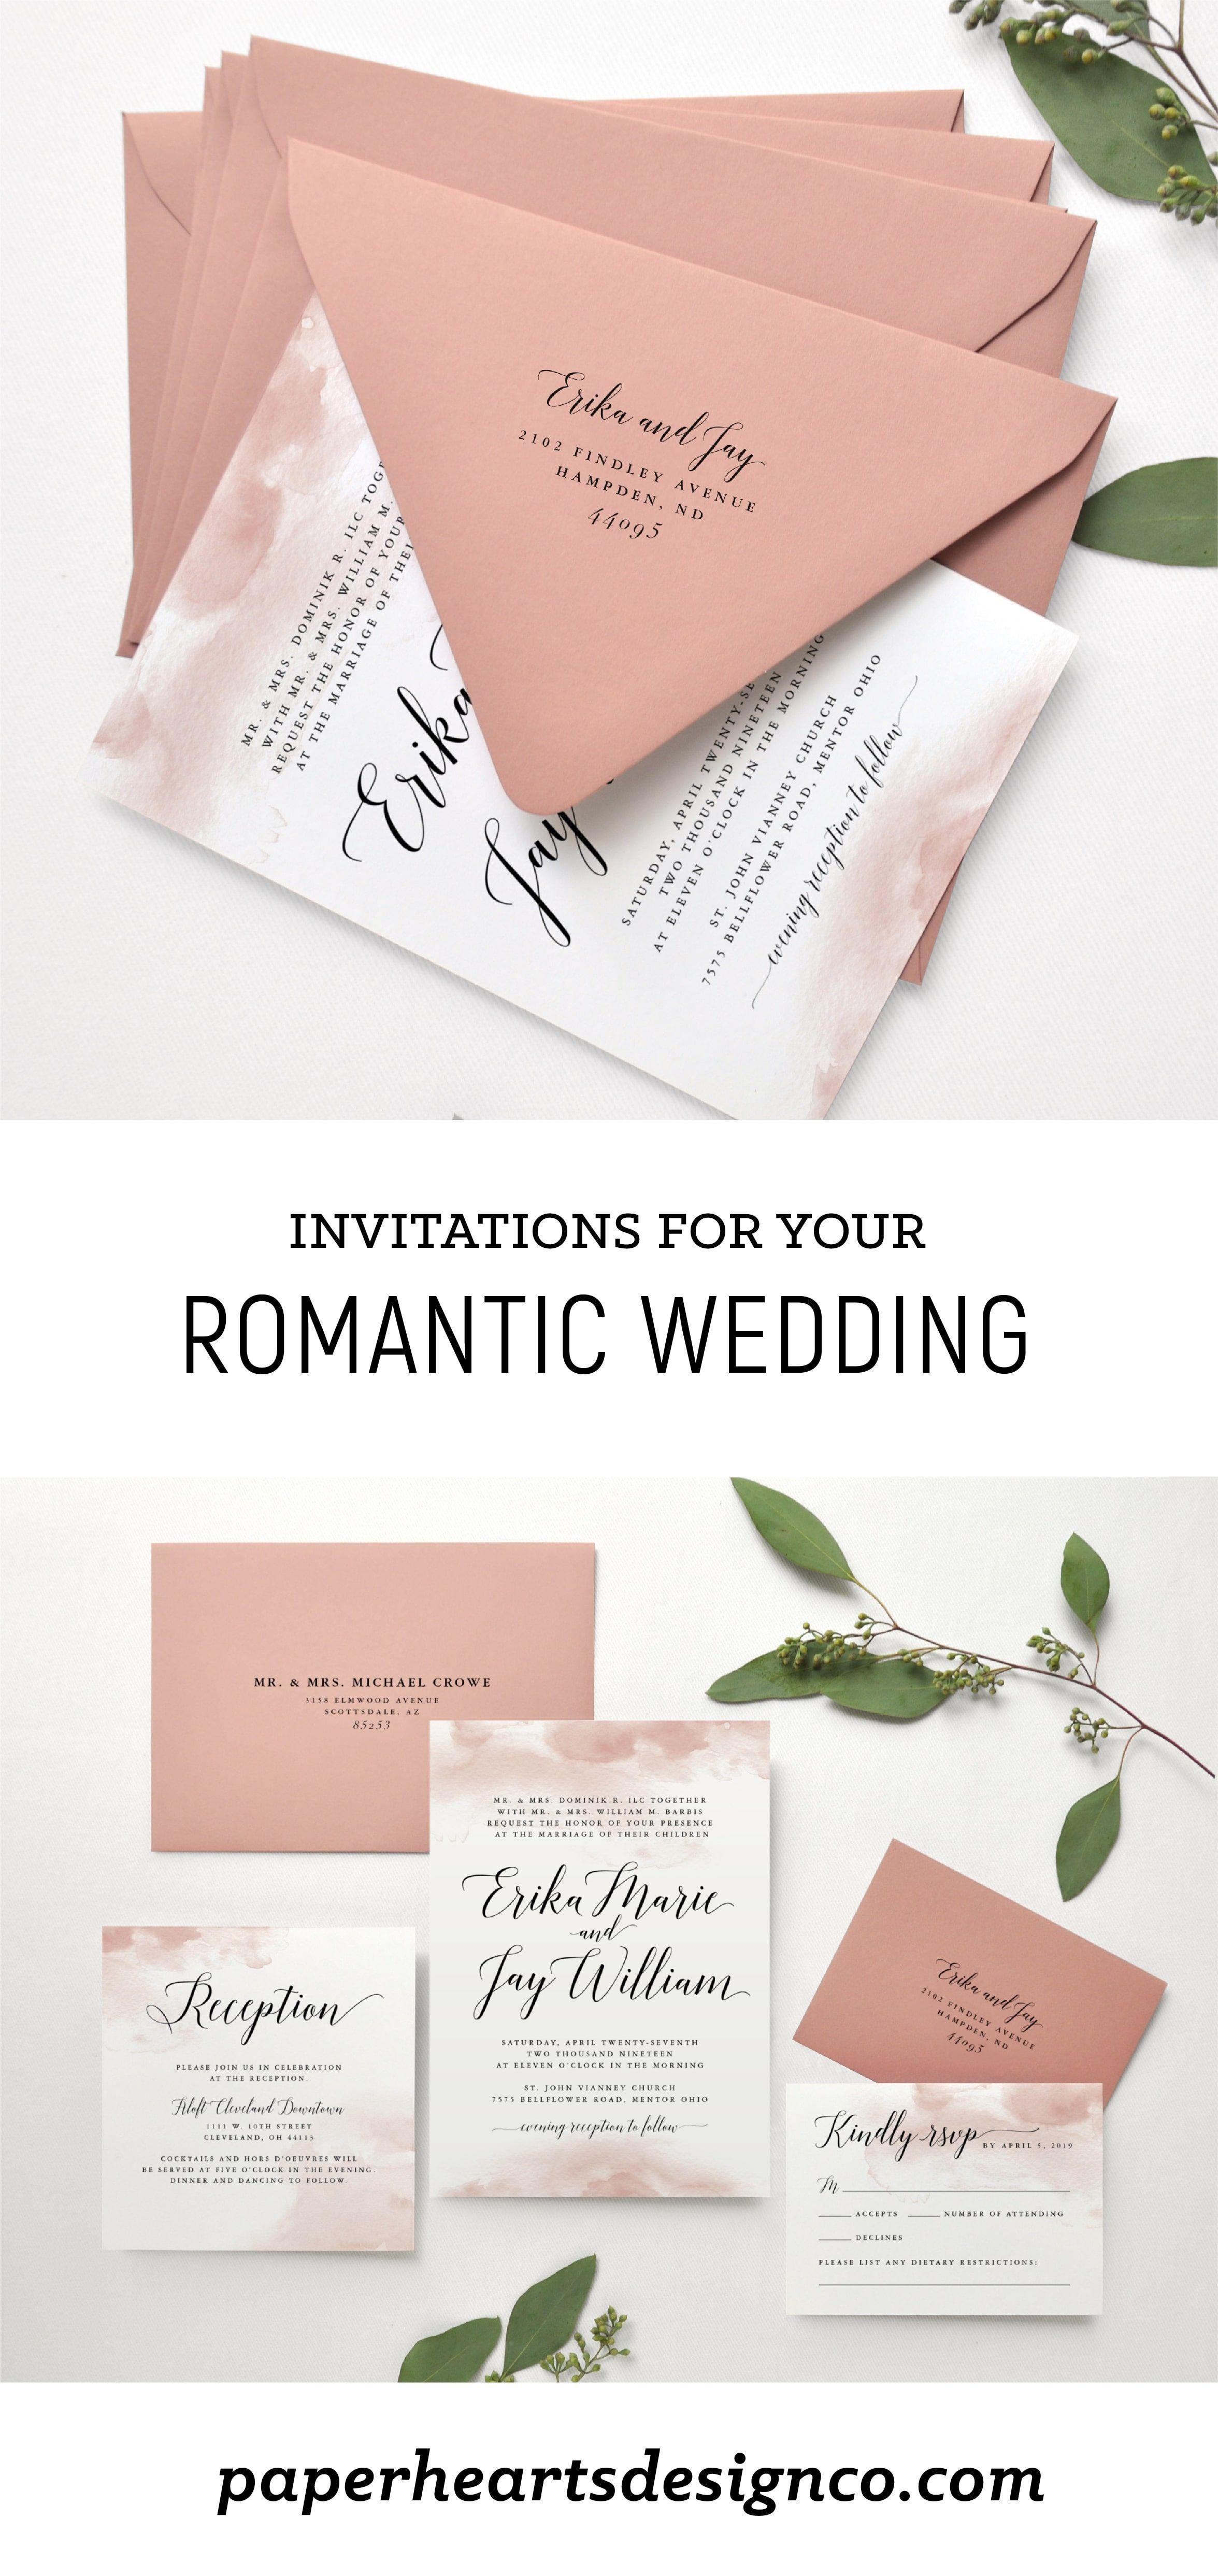 Romantic Watercolor Wedding Invitation By Paper Hearts Design Co Luxury Wedding Wedding Invitations Wedding Invitations Romantic Rose Wedding Invitations